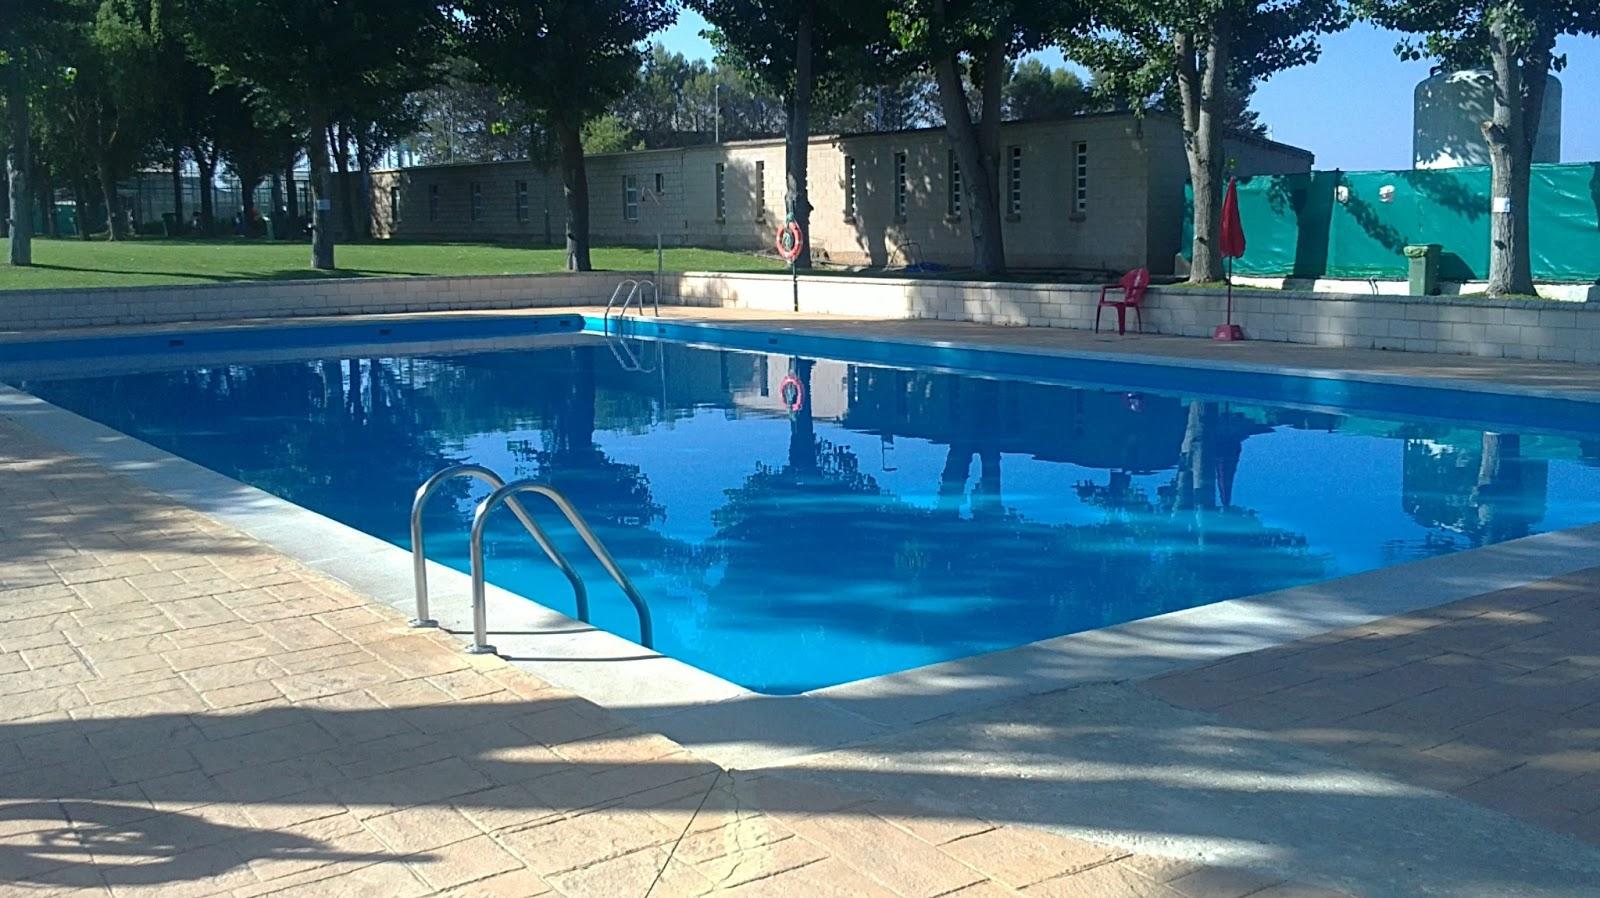 Zafra ciudad deportiva piscina municipal de verano for Piscina municipal de salt